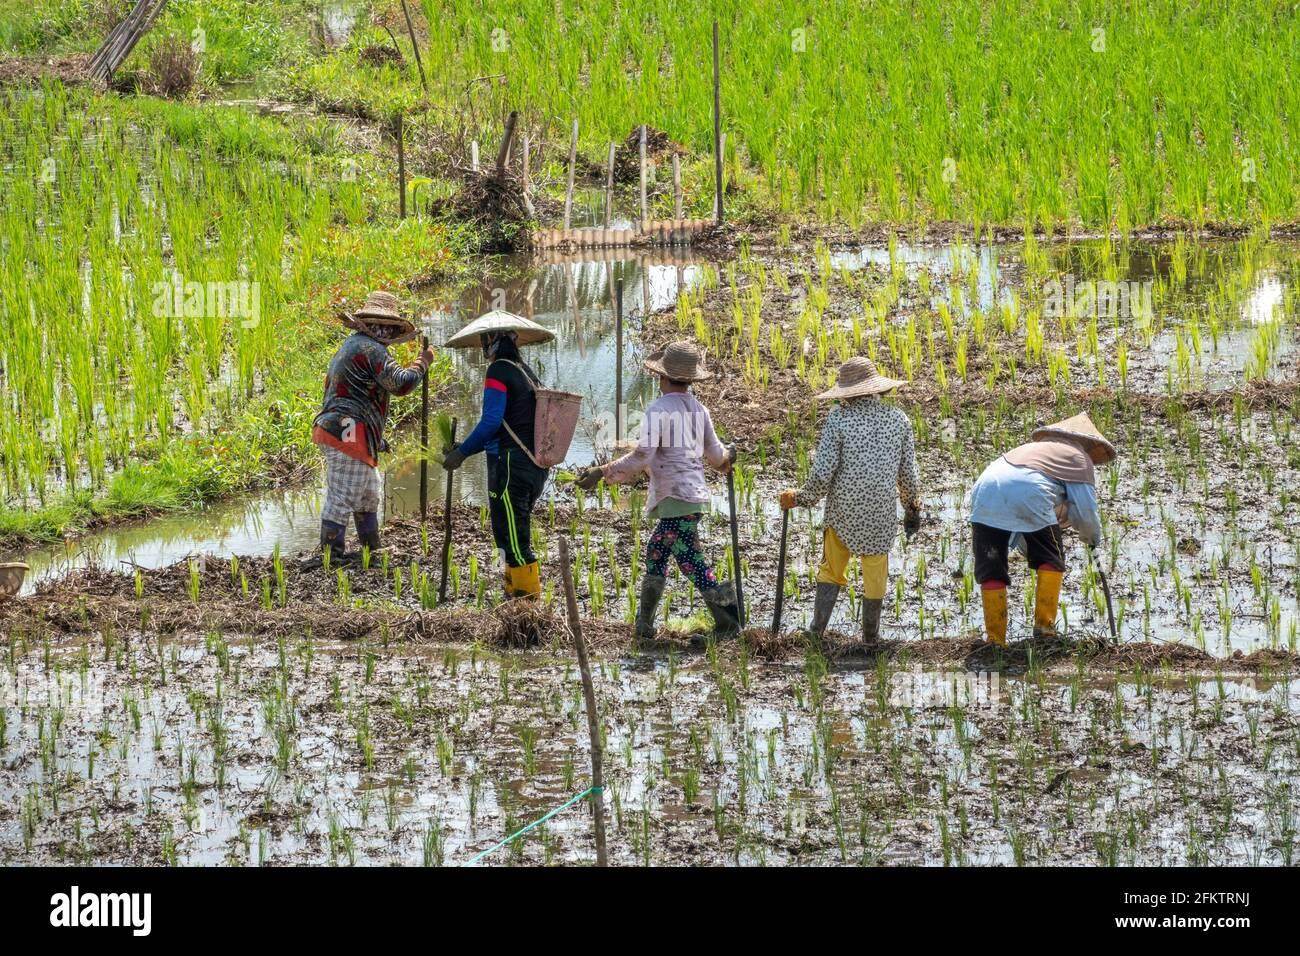 Campo di riso a Tebedu, Serian, Sarawak, Malesia orientale Foto Stock